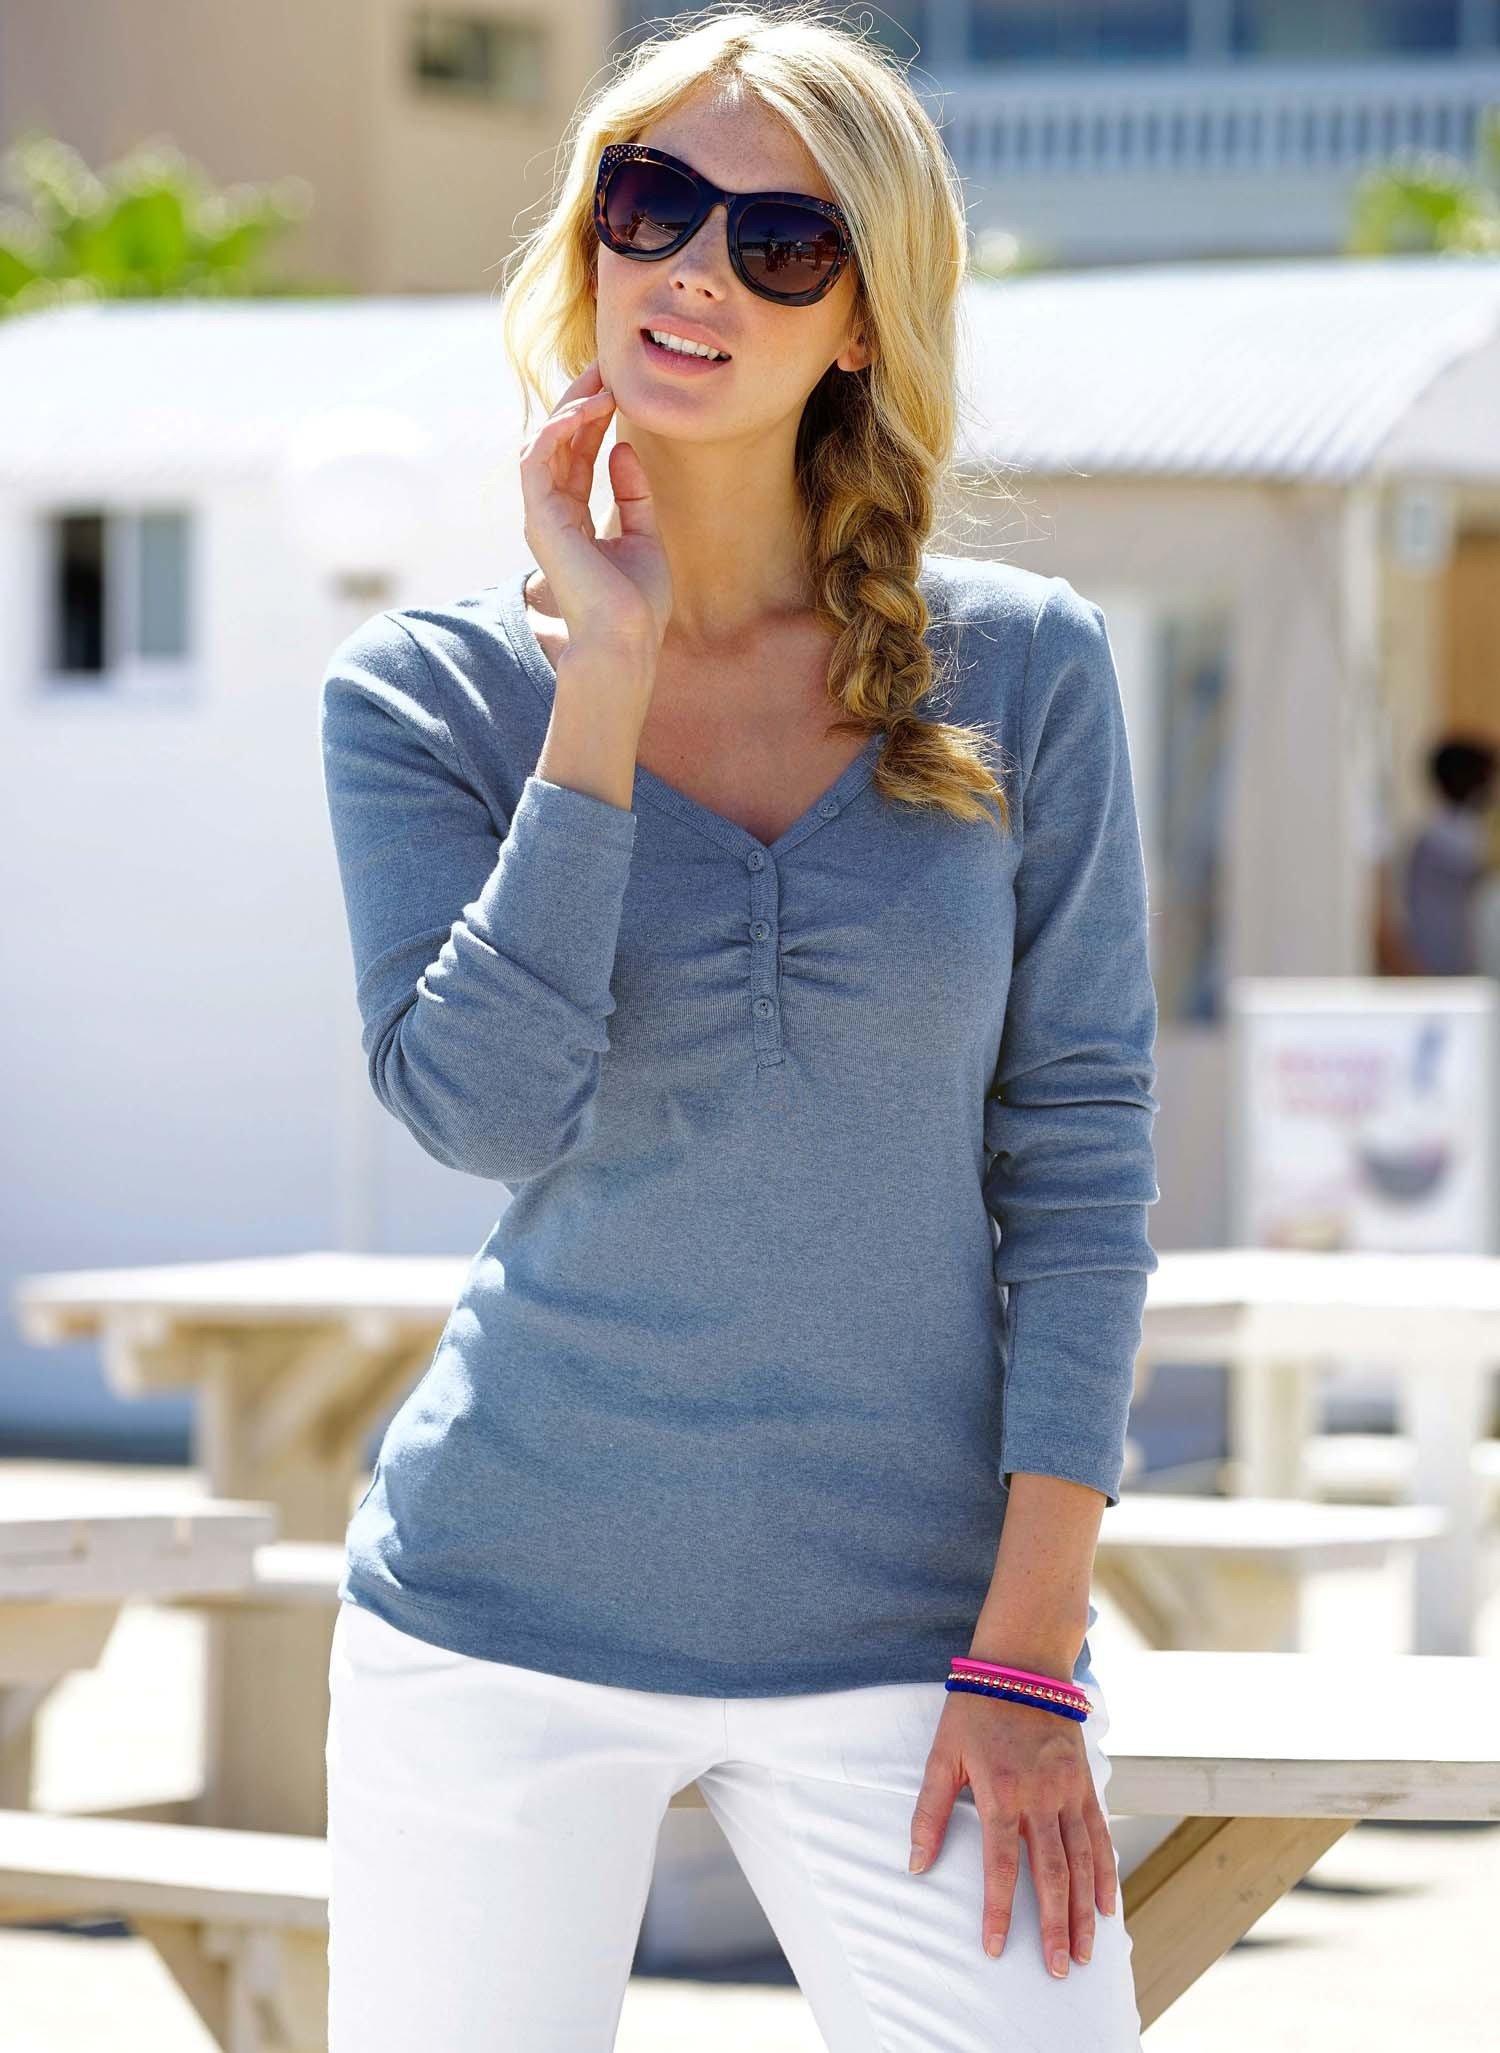 D-LA-Shirt,V-Auss.indigo mel. S 366 - 1 - Ronja.ch